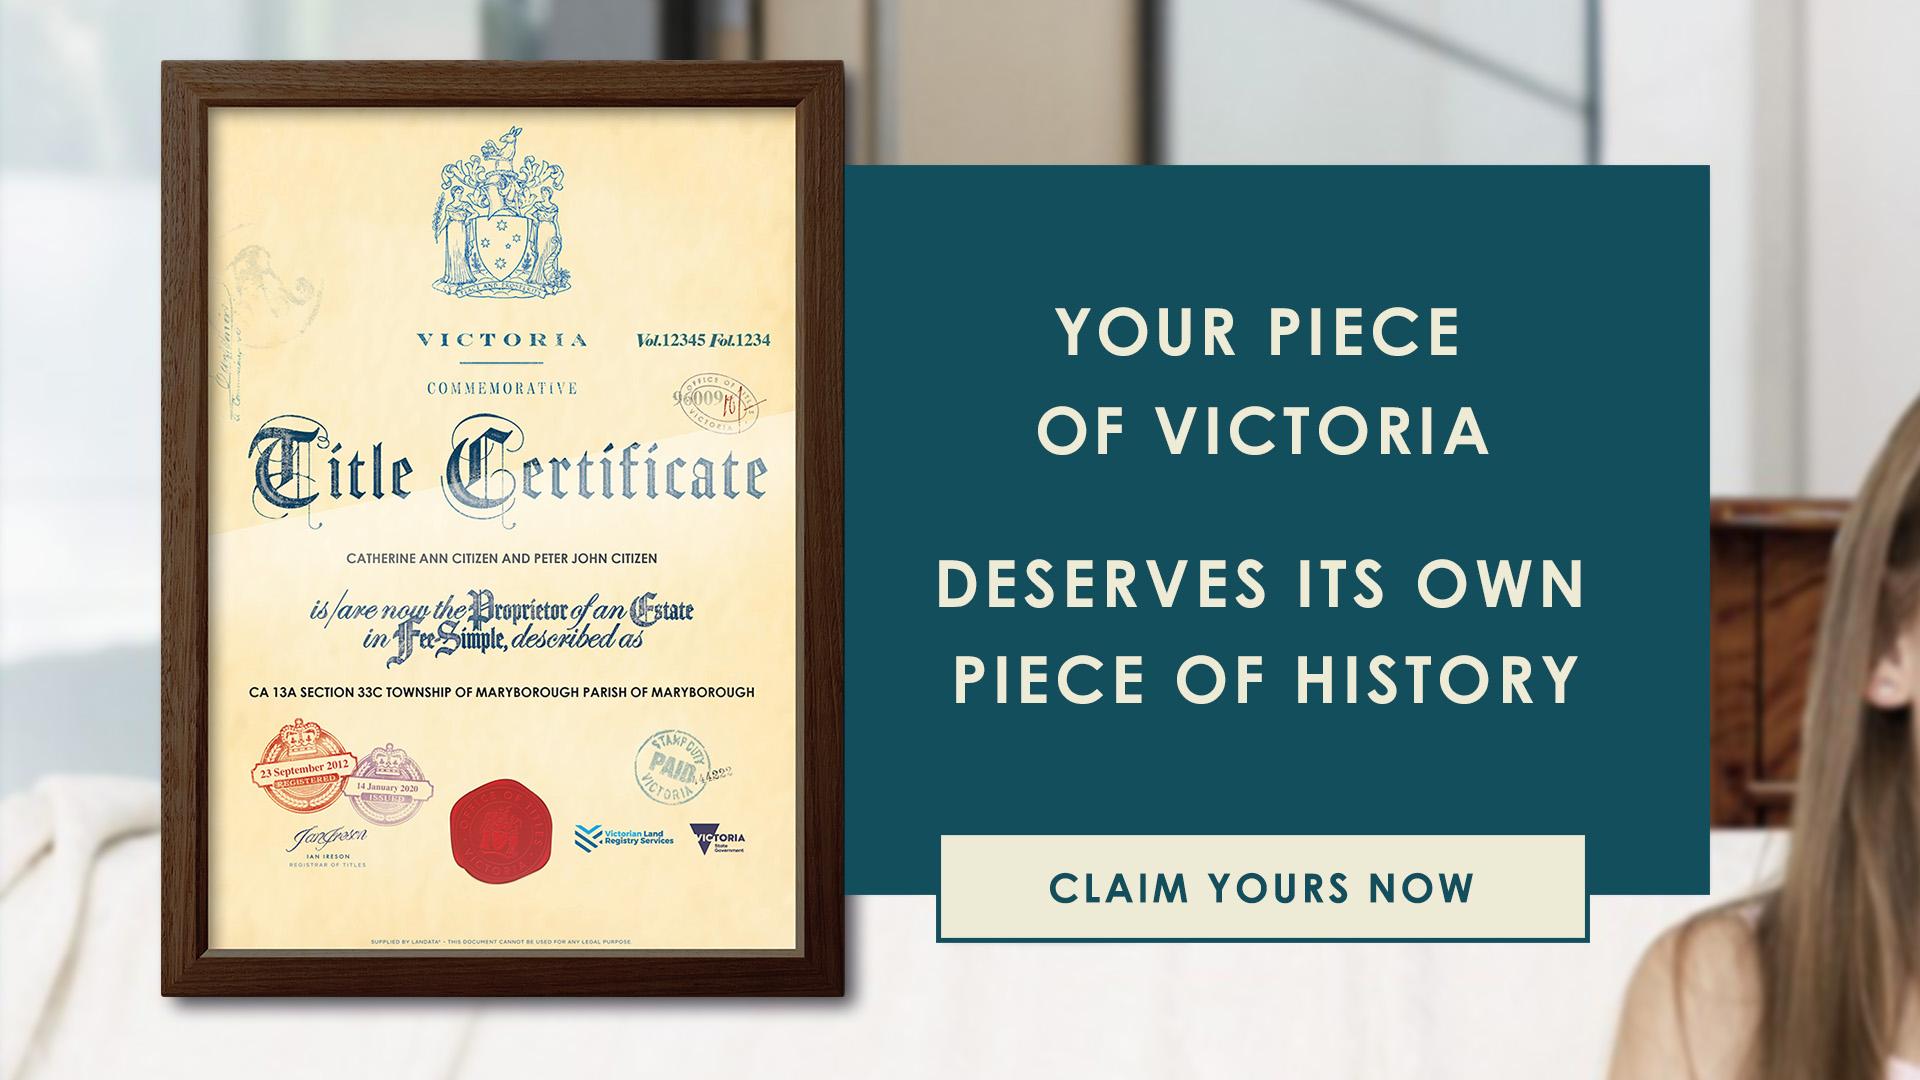 Victorian Commemorative Title Certificate